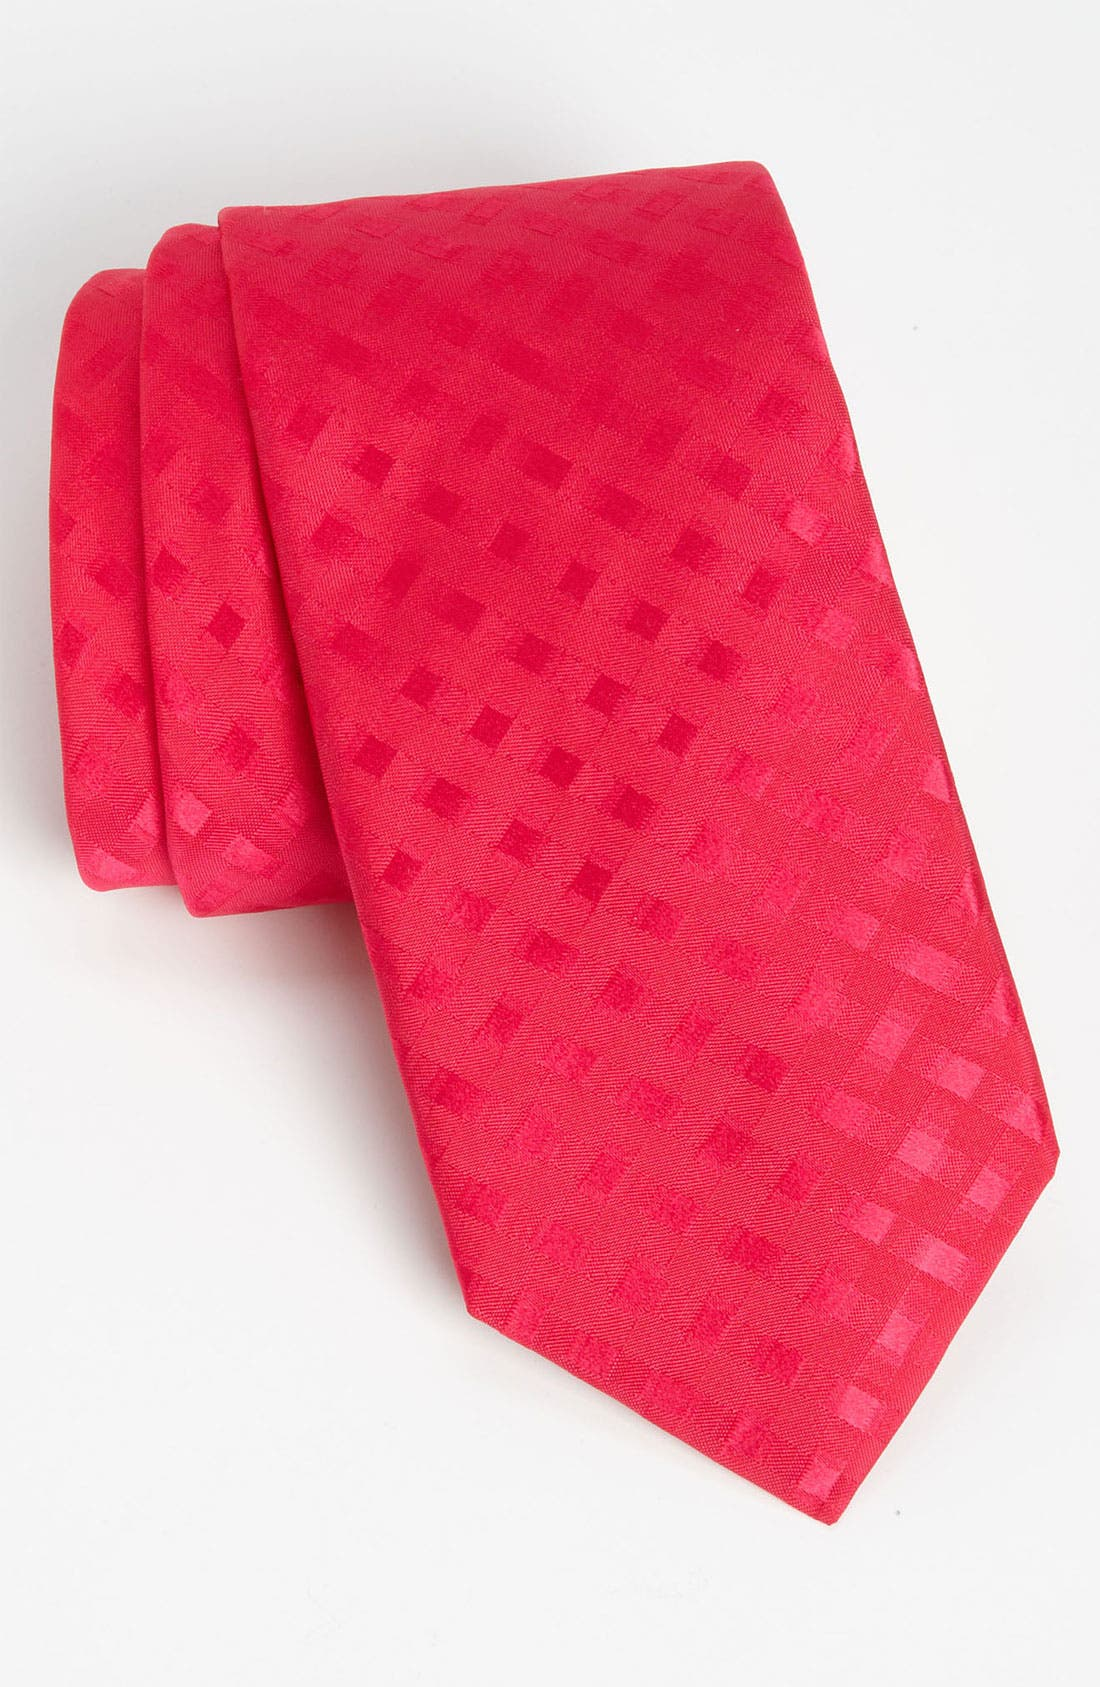 Alternate Image 1 Selected - Thomas Pink 'Lytton' Woven Silk Tie